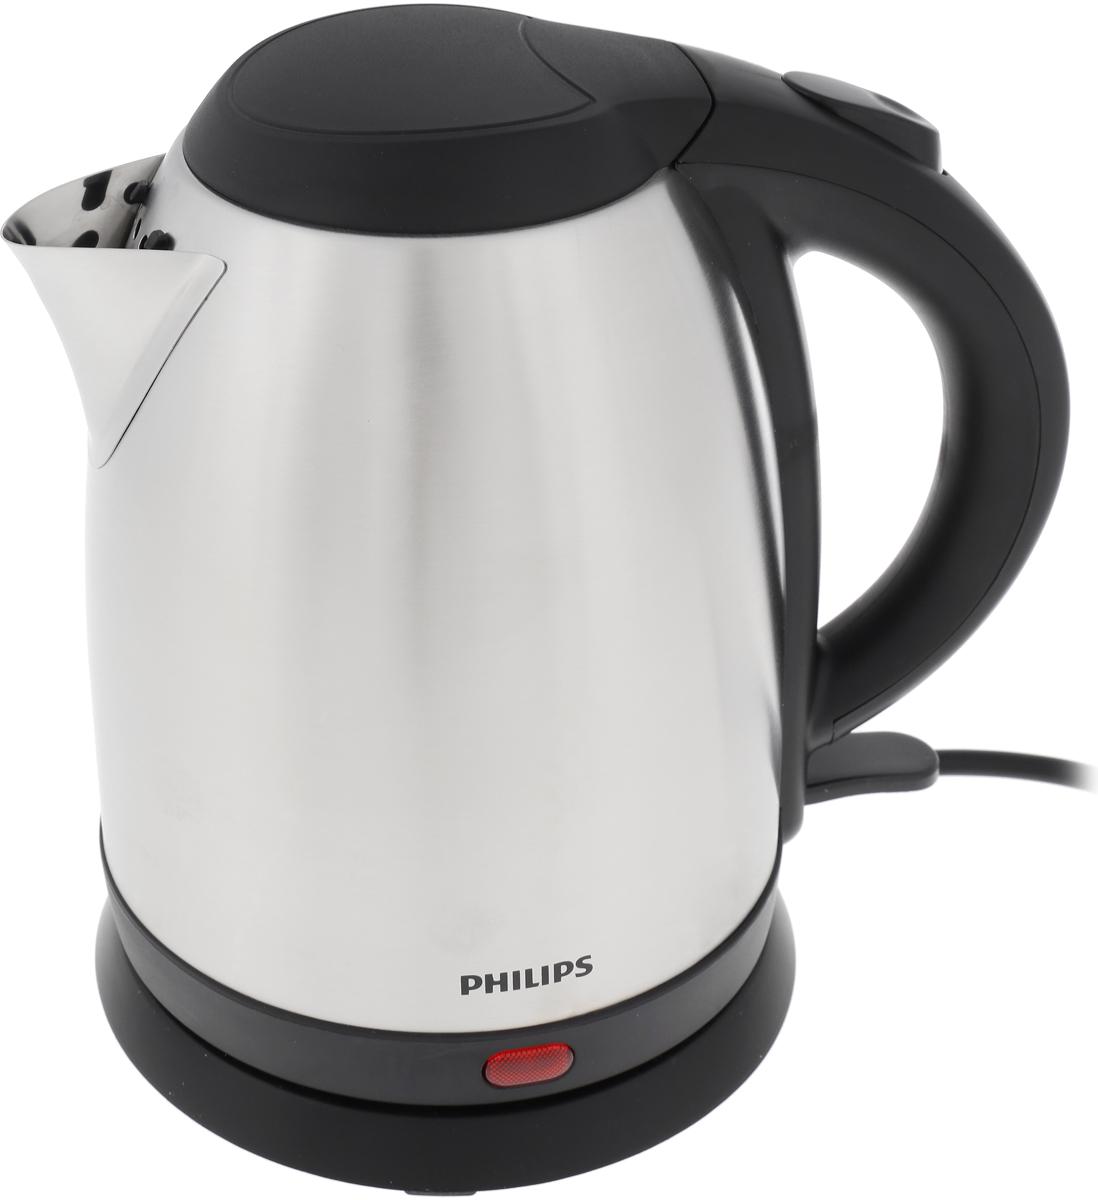 лучшая цена Philips HD9306/02 электрический чайник